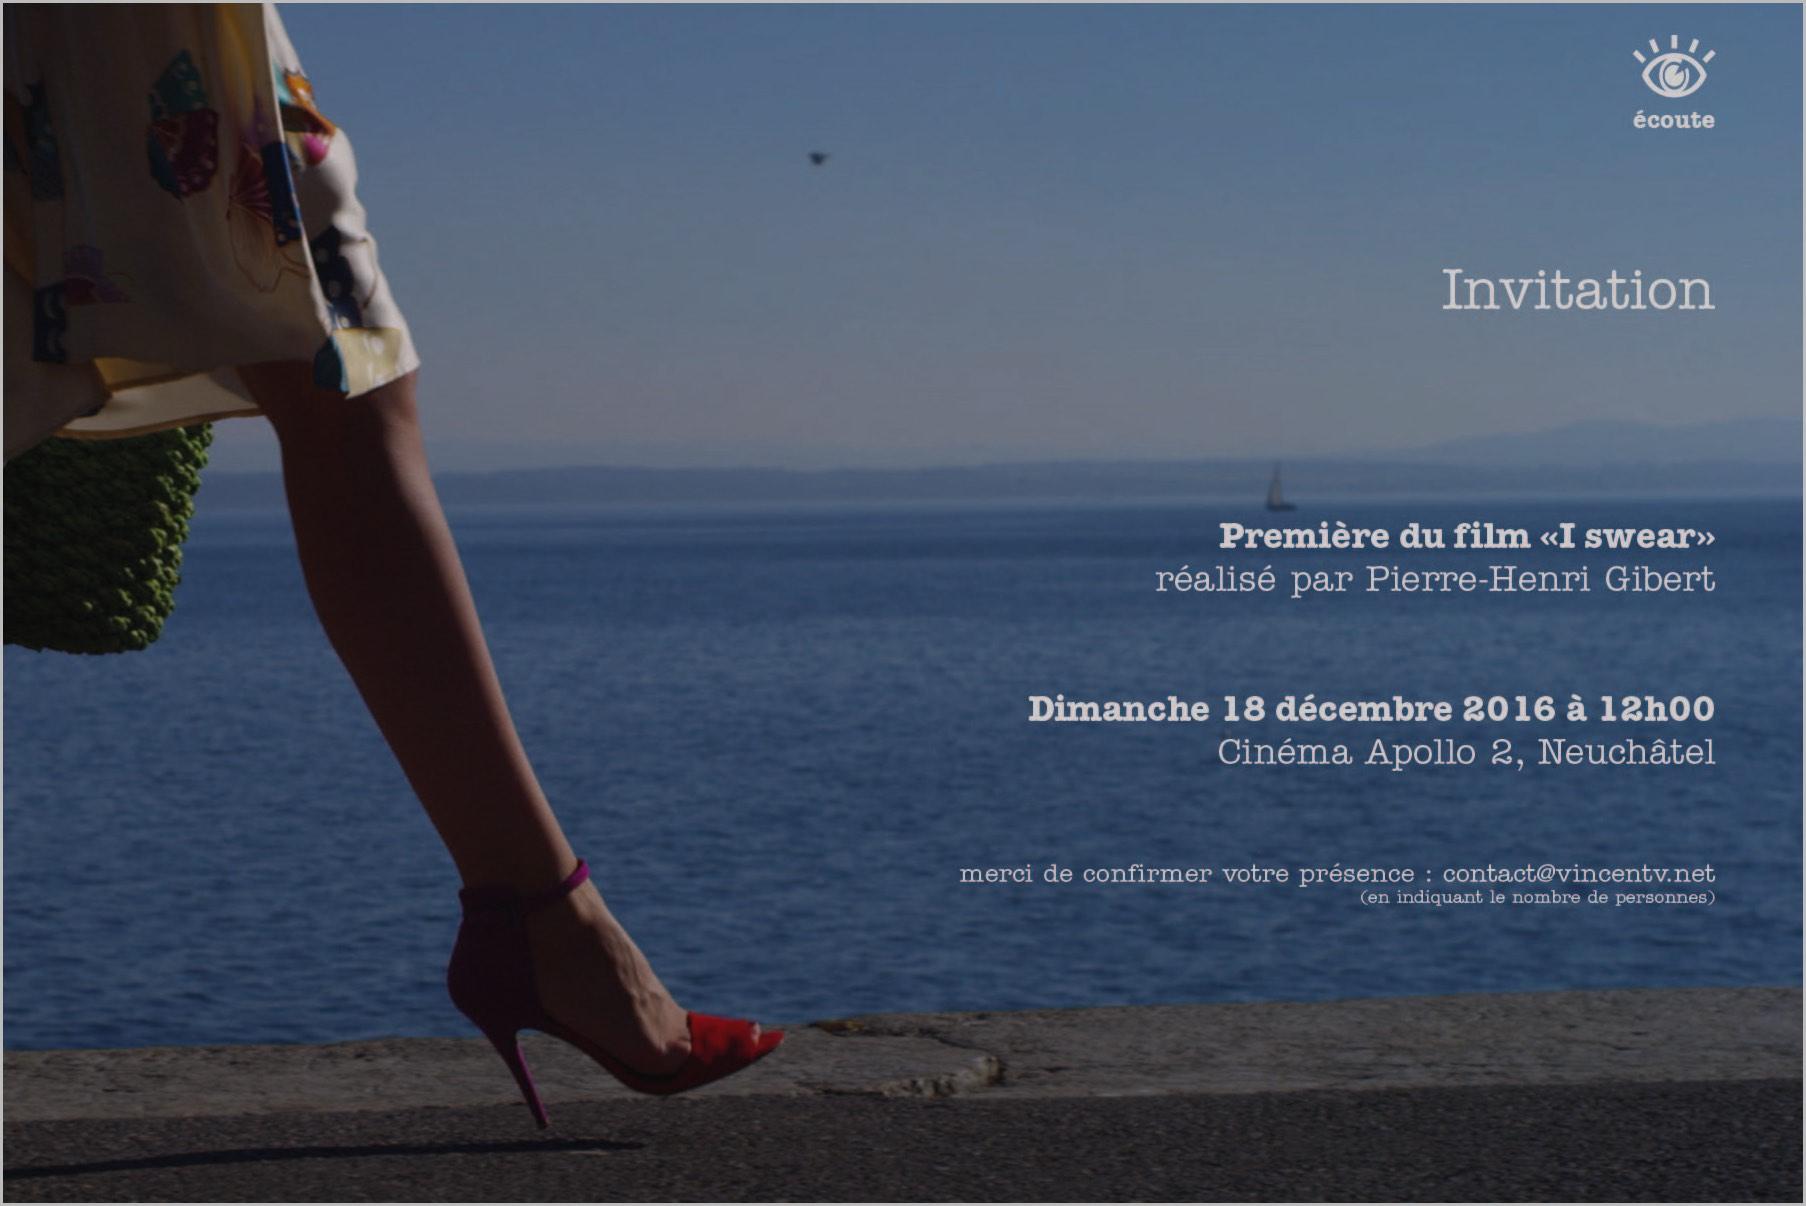 Invitation_I_swear INVITATION - La Première du film I swear